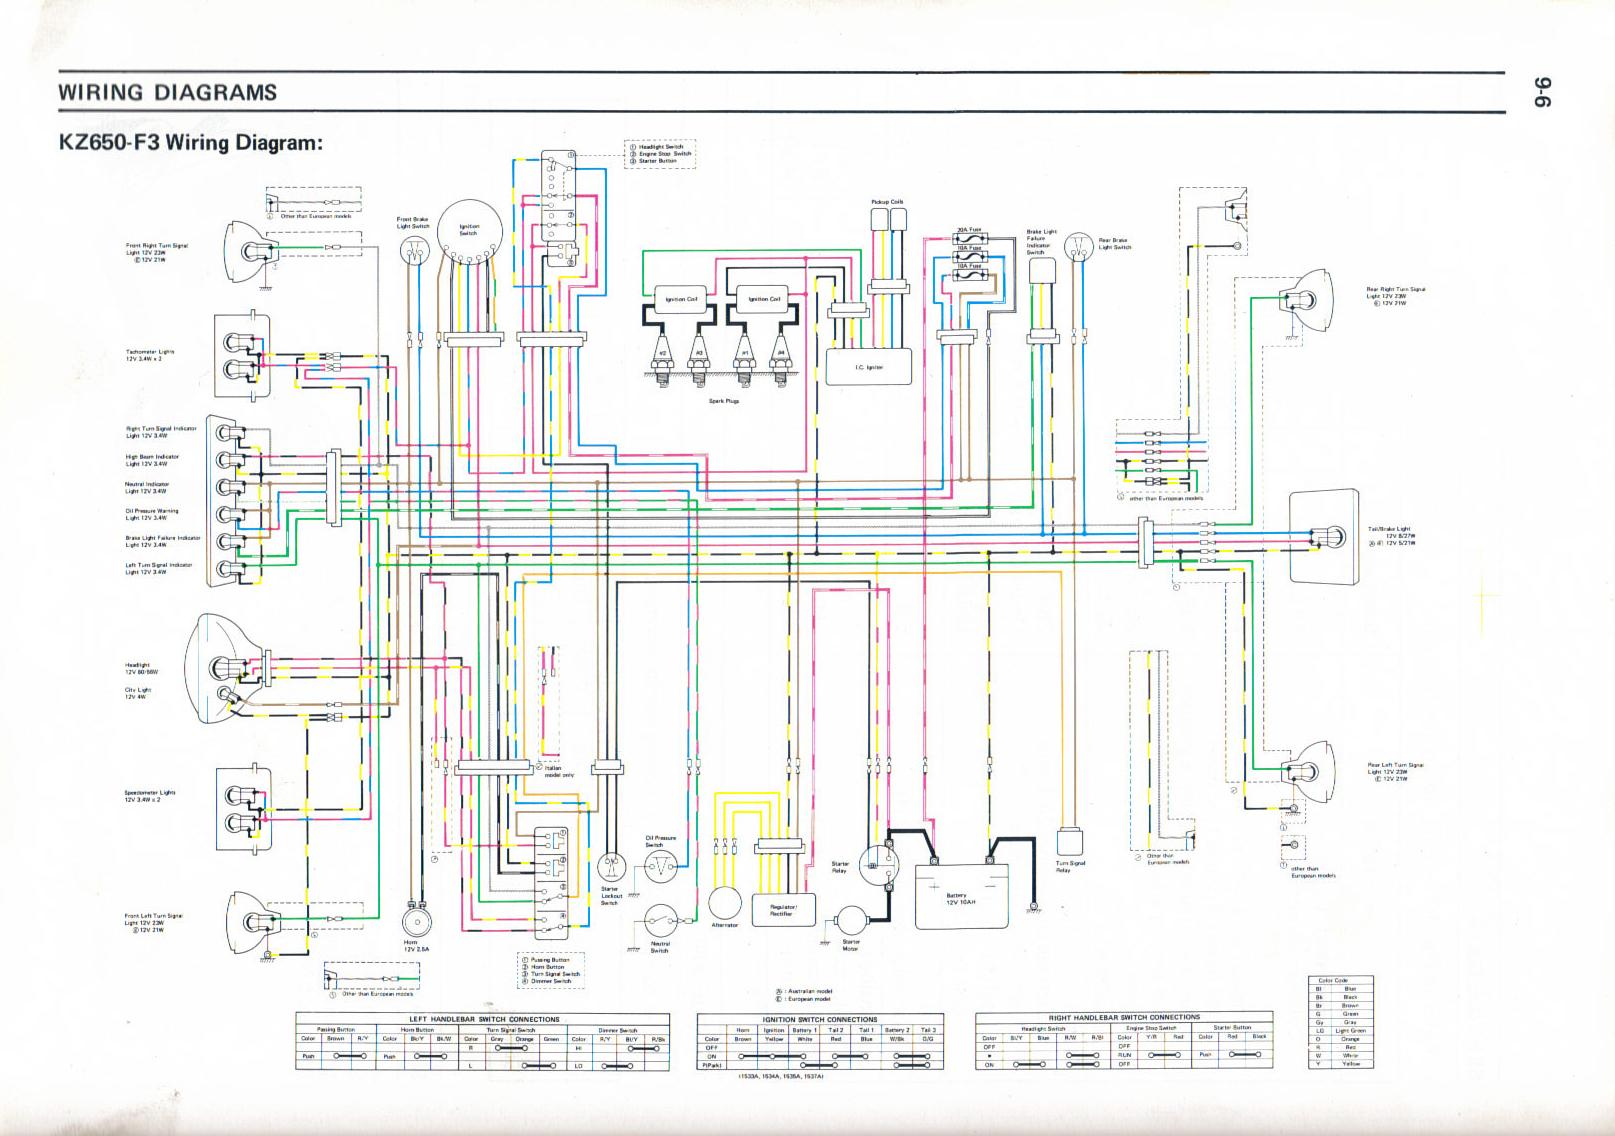 1976 Kz900 Wiring Diagram - Lir Wiring 101 on ninja 250r wiring diagram, kz440 wiring diagram, vulcan 1500 wiring diagram, zl1000 wiring diagram, kz200 wiring diagram, kz750 wiring diagram, kz650 wiring diagram, ex250 wiring diagram, ex500 wiring diagram, kz400 wiring diagram, ke175 wiring diagram, zx7r wiring diagram, zx12 wiring diagram, klr650 wiring diagram, kz550 wiring diagram, kawasaki wiring diagram, gs400 wiring diagram, z1000 wiring diagram, kz1000 wiring diagram, vn1500 wiring diagram,